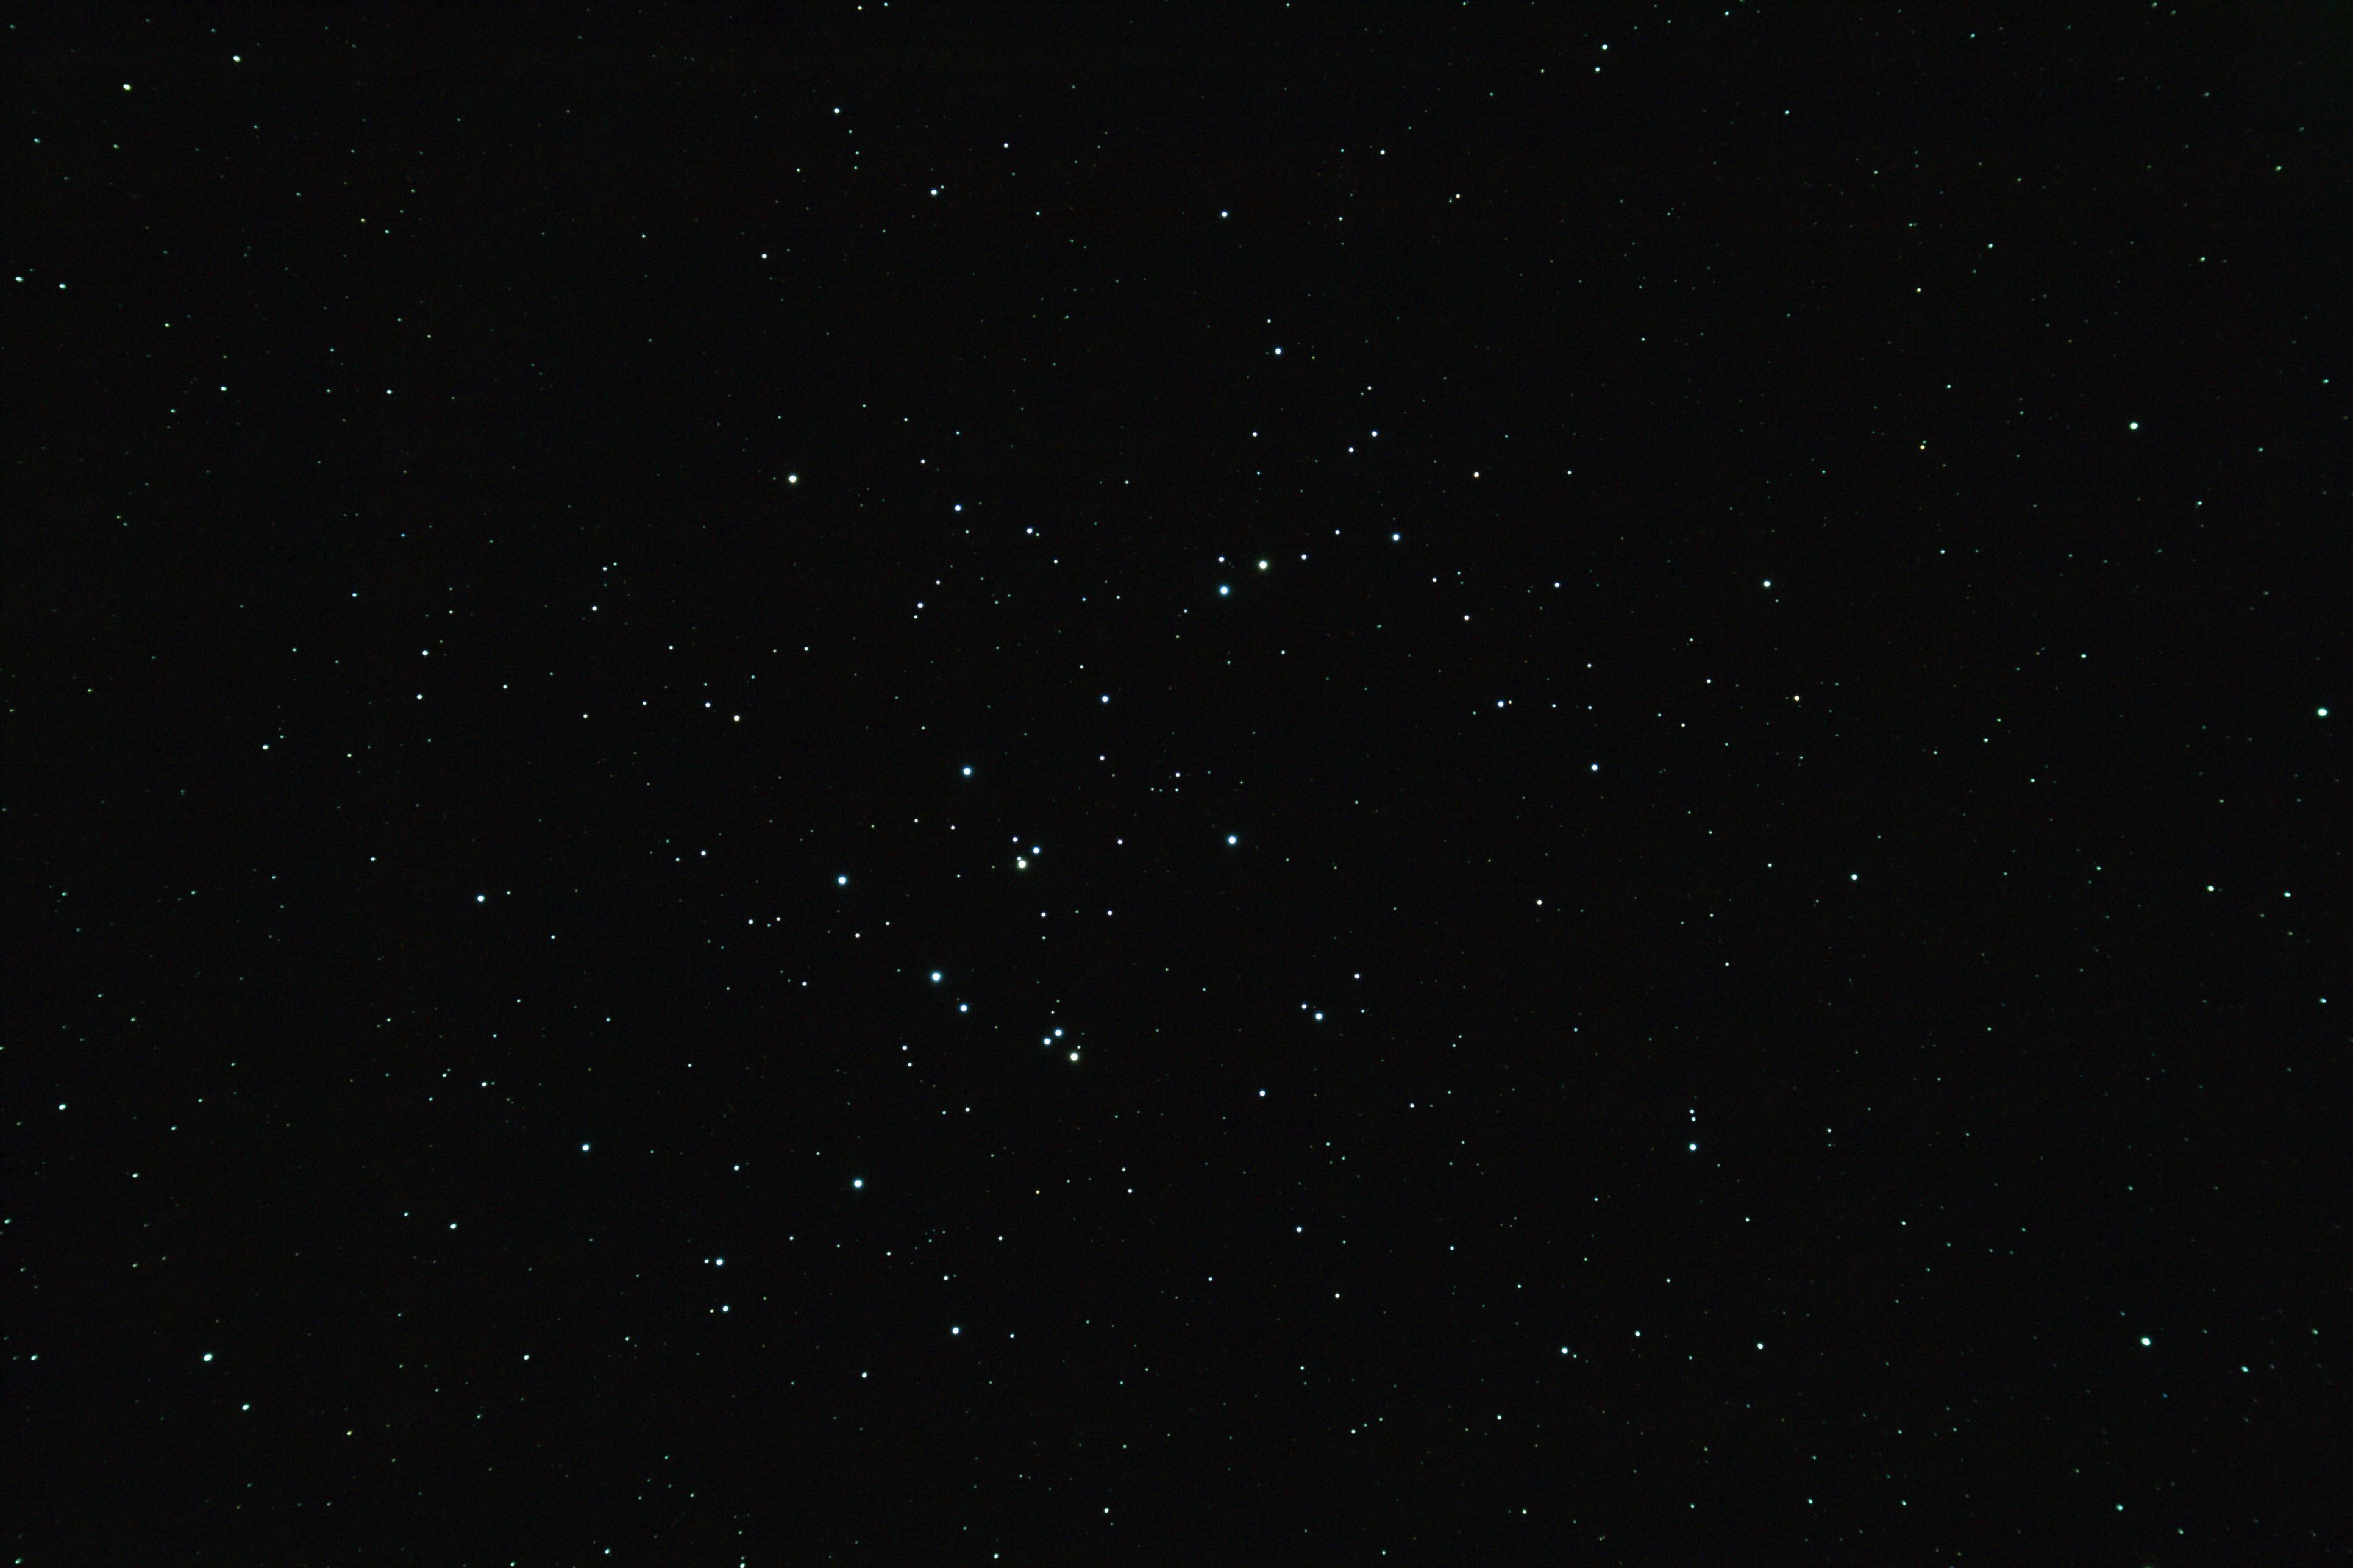 Messier 44 - Open Cluster